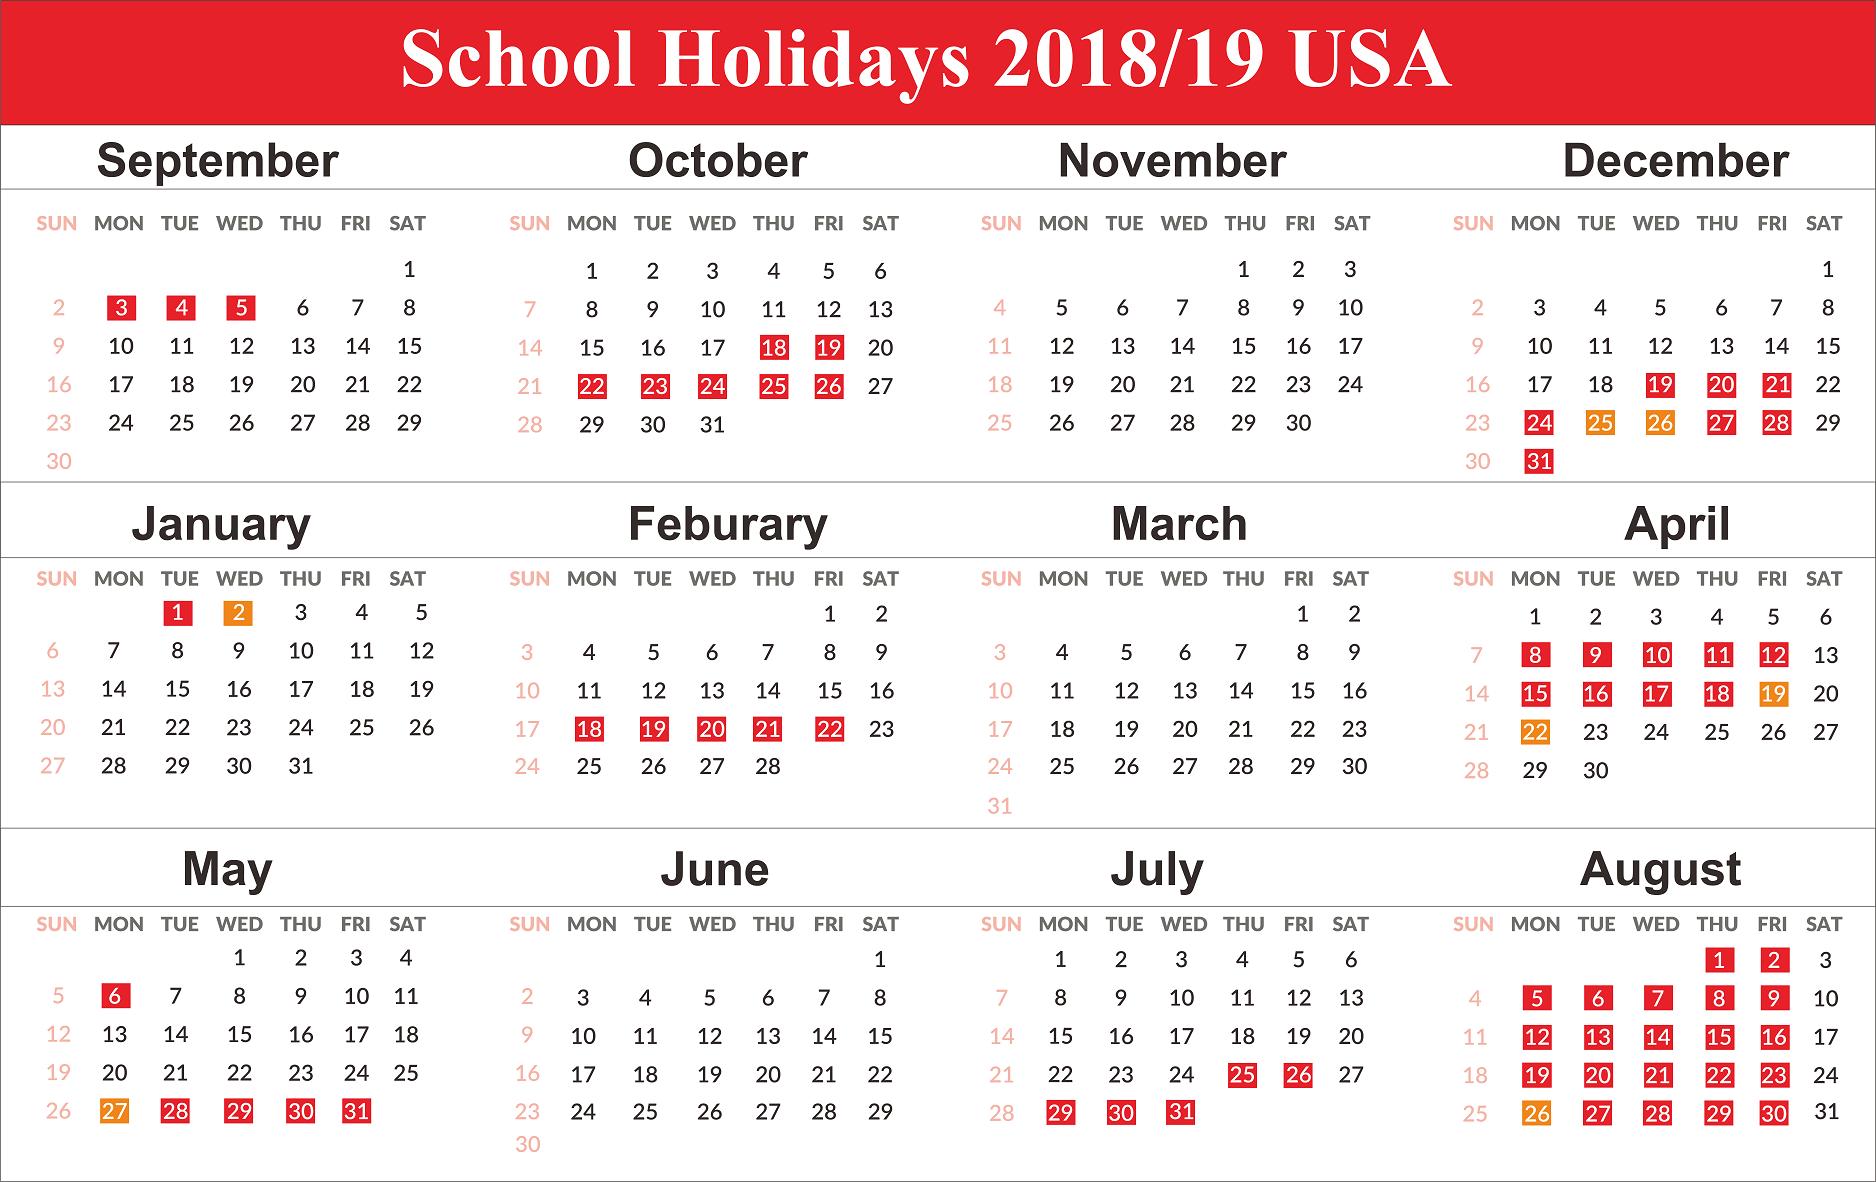 Us Holidays 2020 | School Calendar, School Holiday Calendar with Uri Academic Calendar Holiday